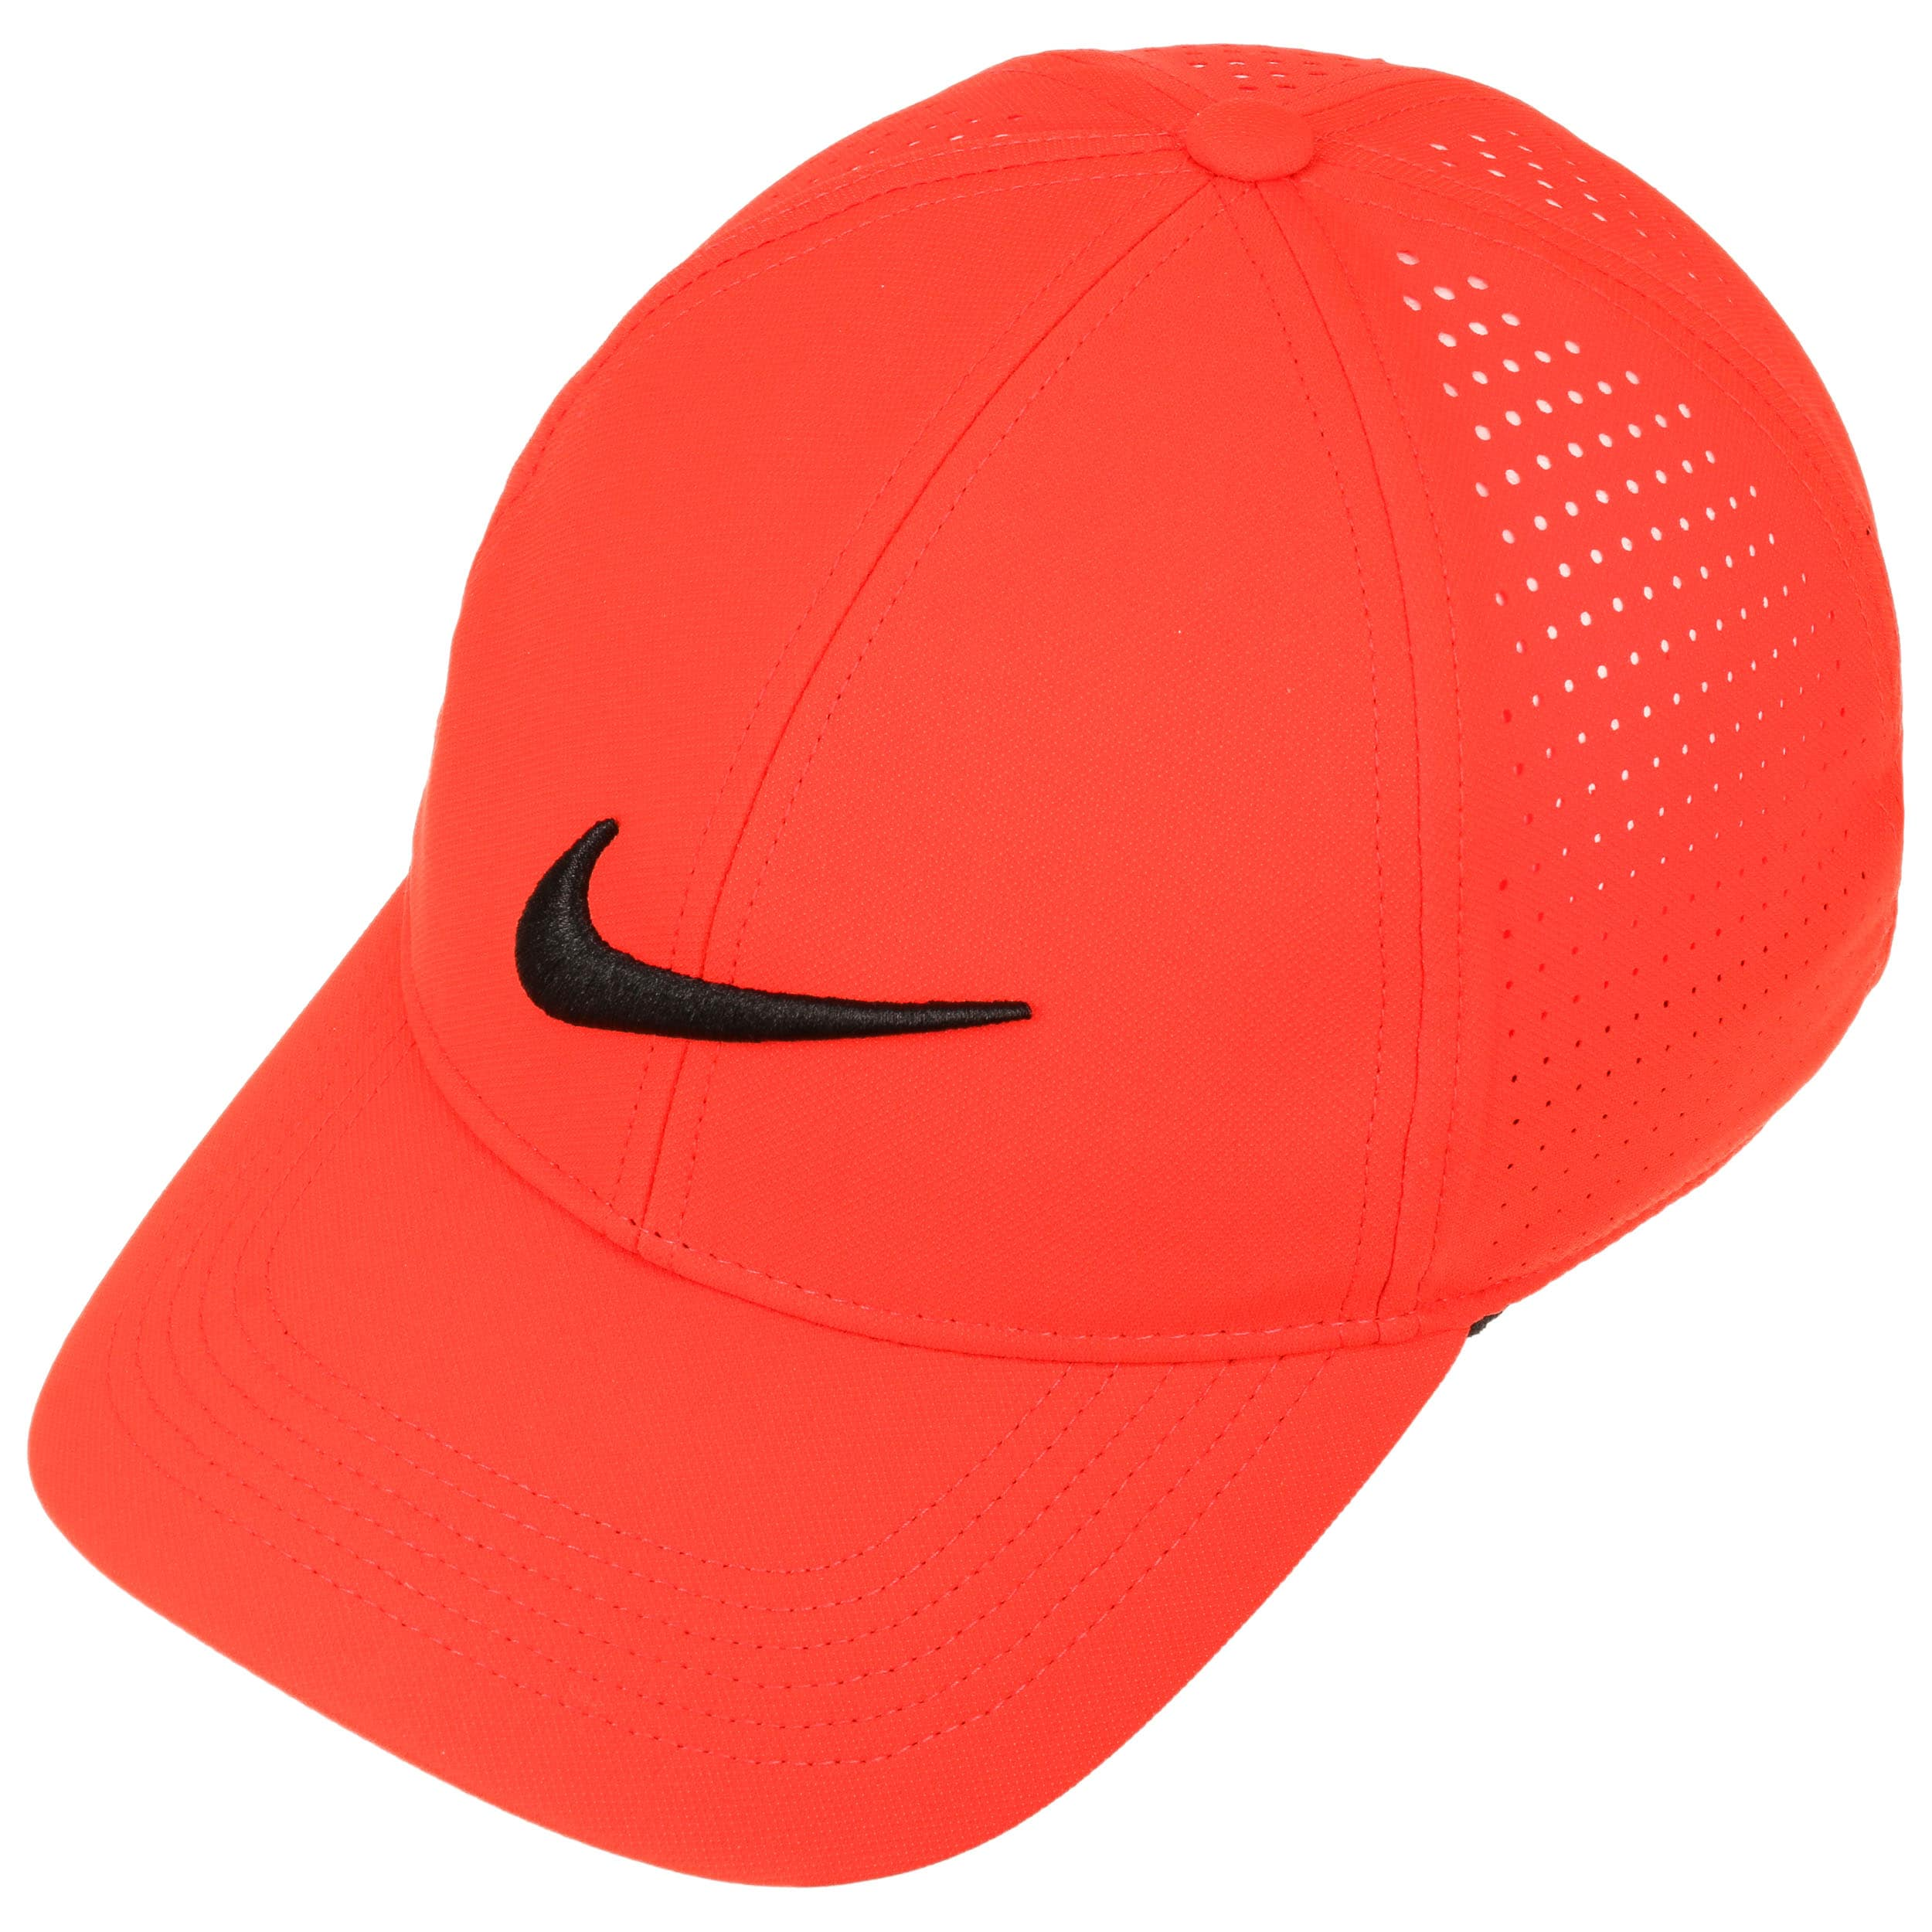 ... Legacy 91 Perf Strapback Cap by Nike - orange 1 ... 6a4e18e39fea